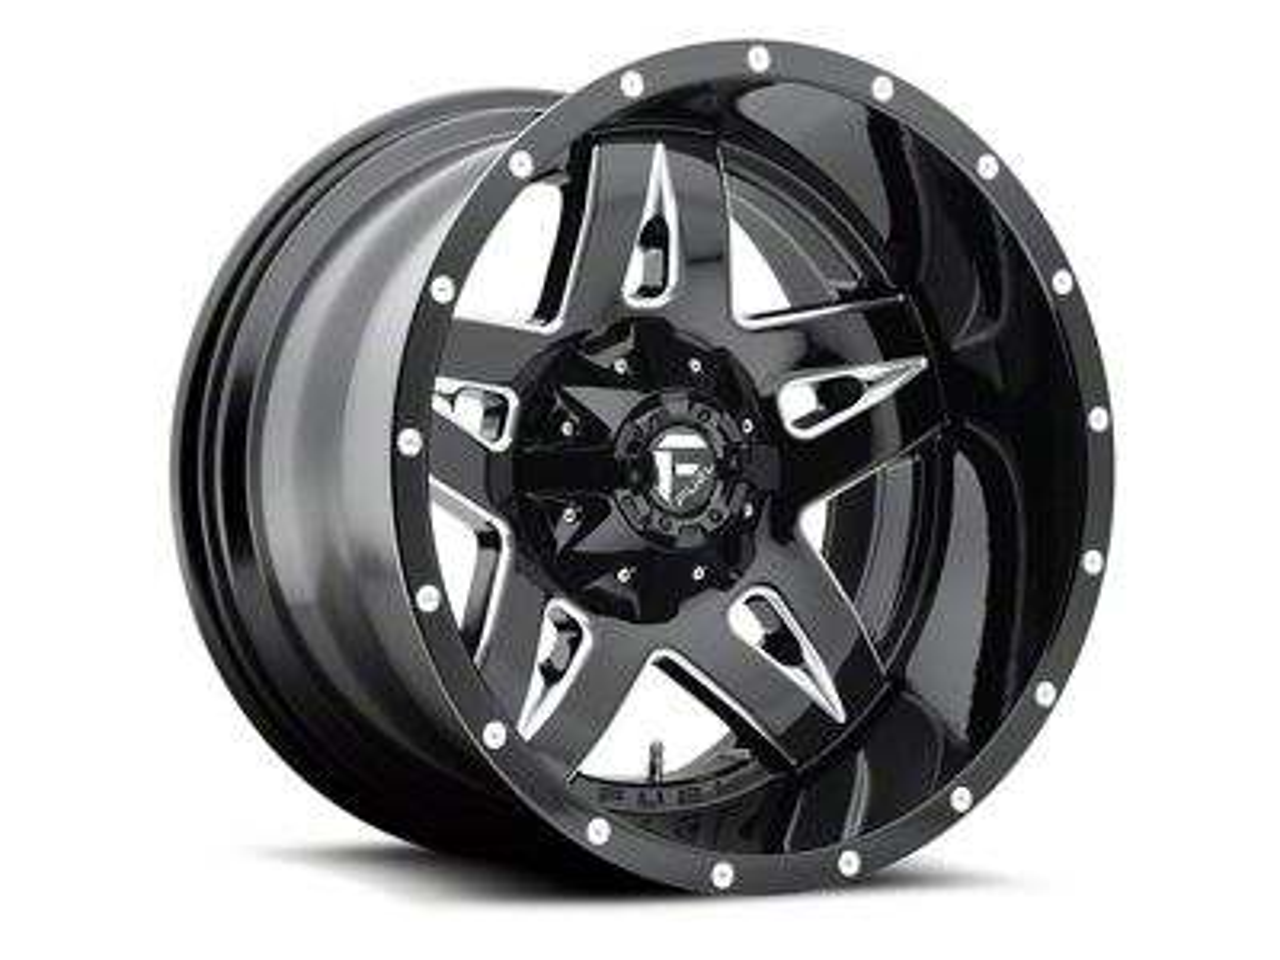 Fuel Wheels Full Blown Black Milled 6-Lug Wheel - 20x9 (07-18 Sierra 1500)